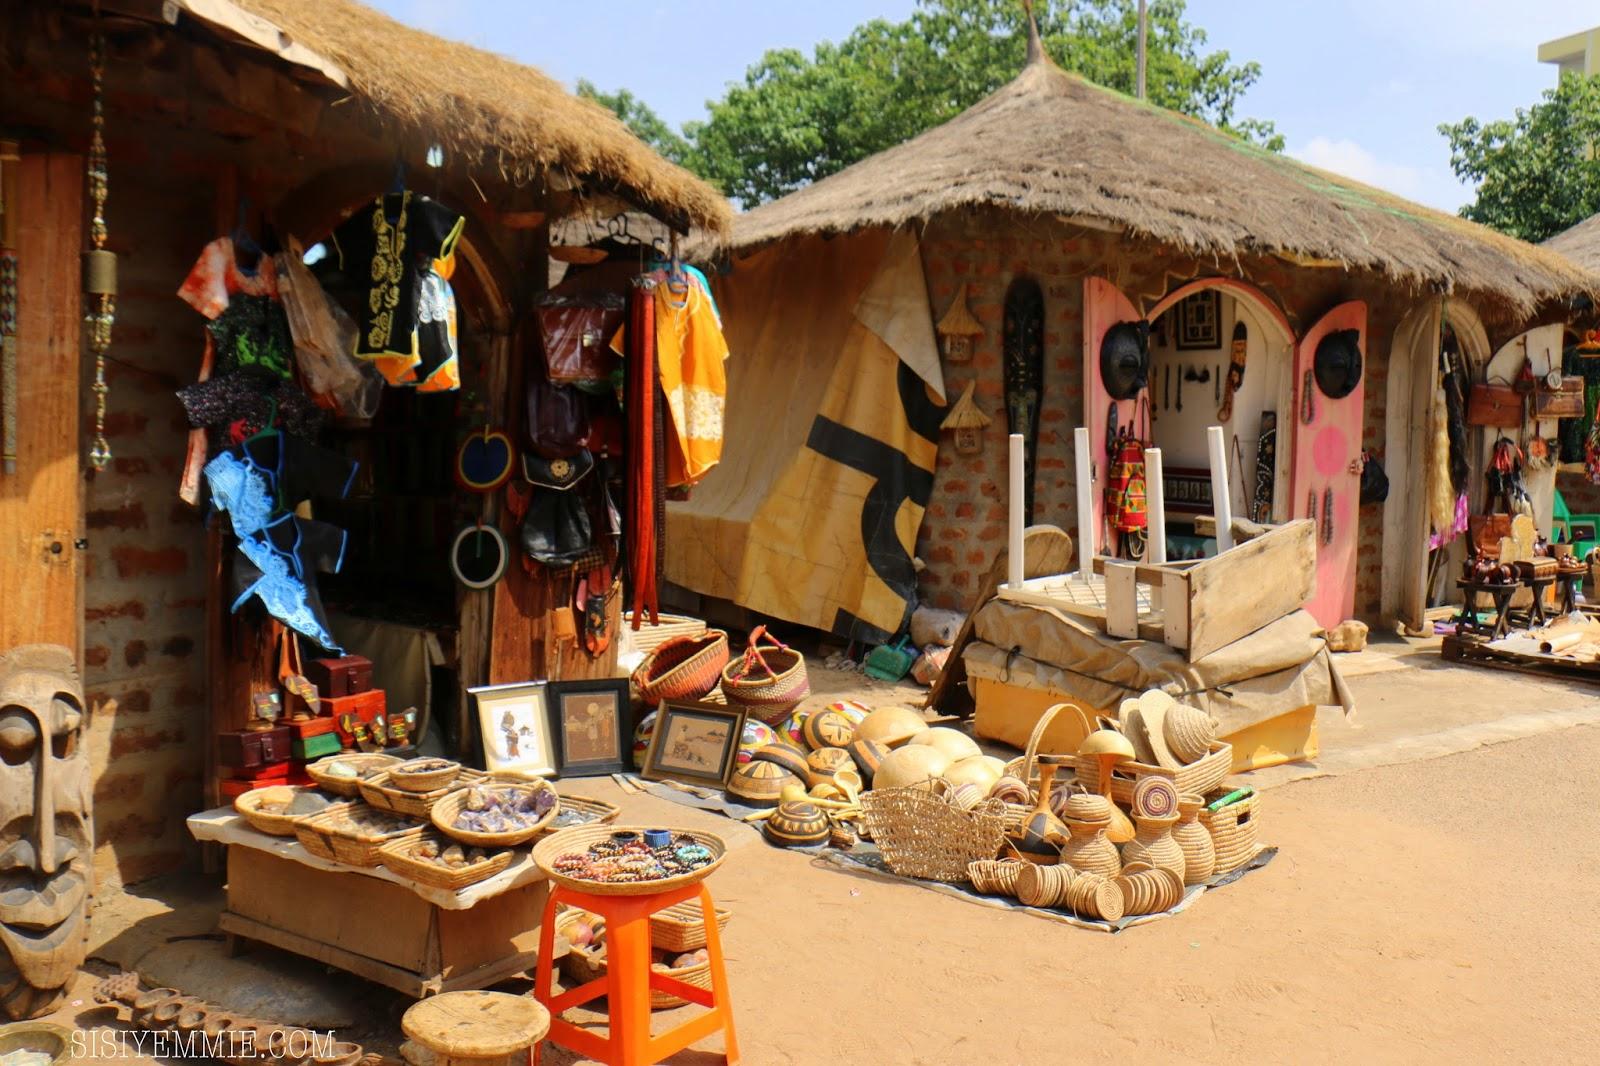 Abuja Arts And Crafts Village